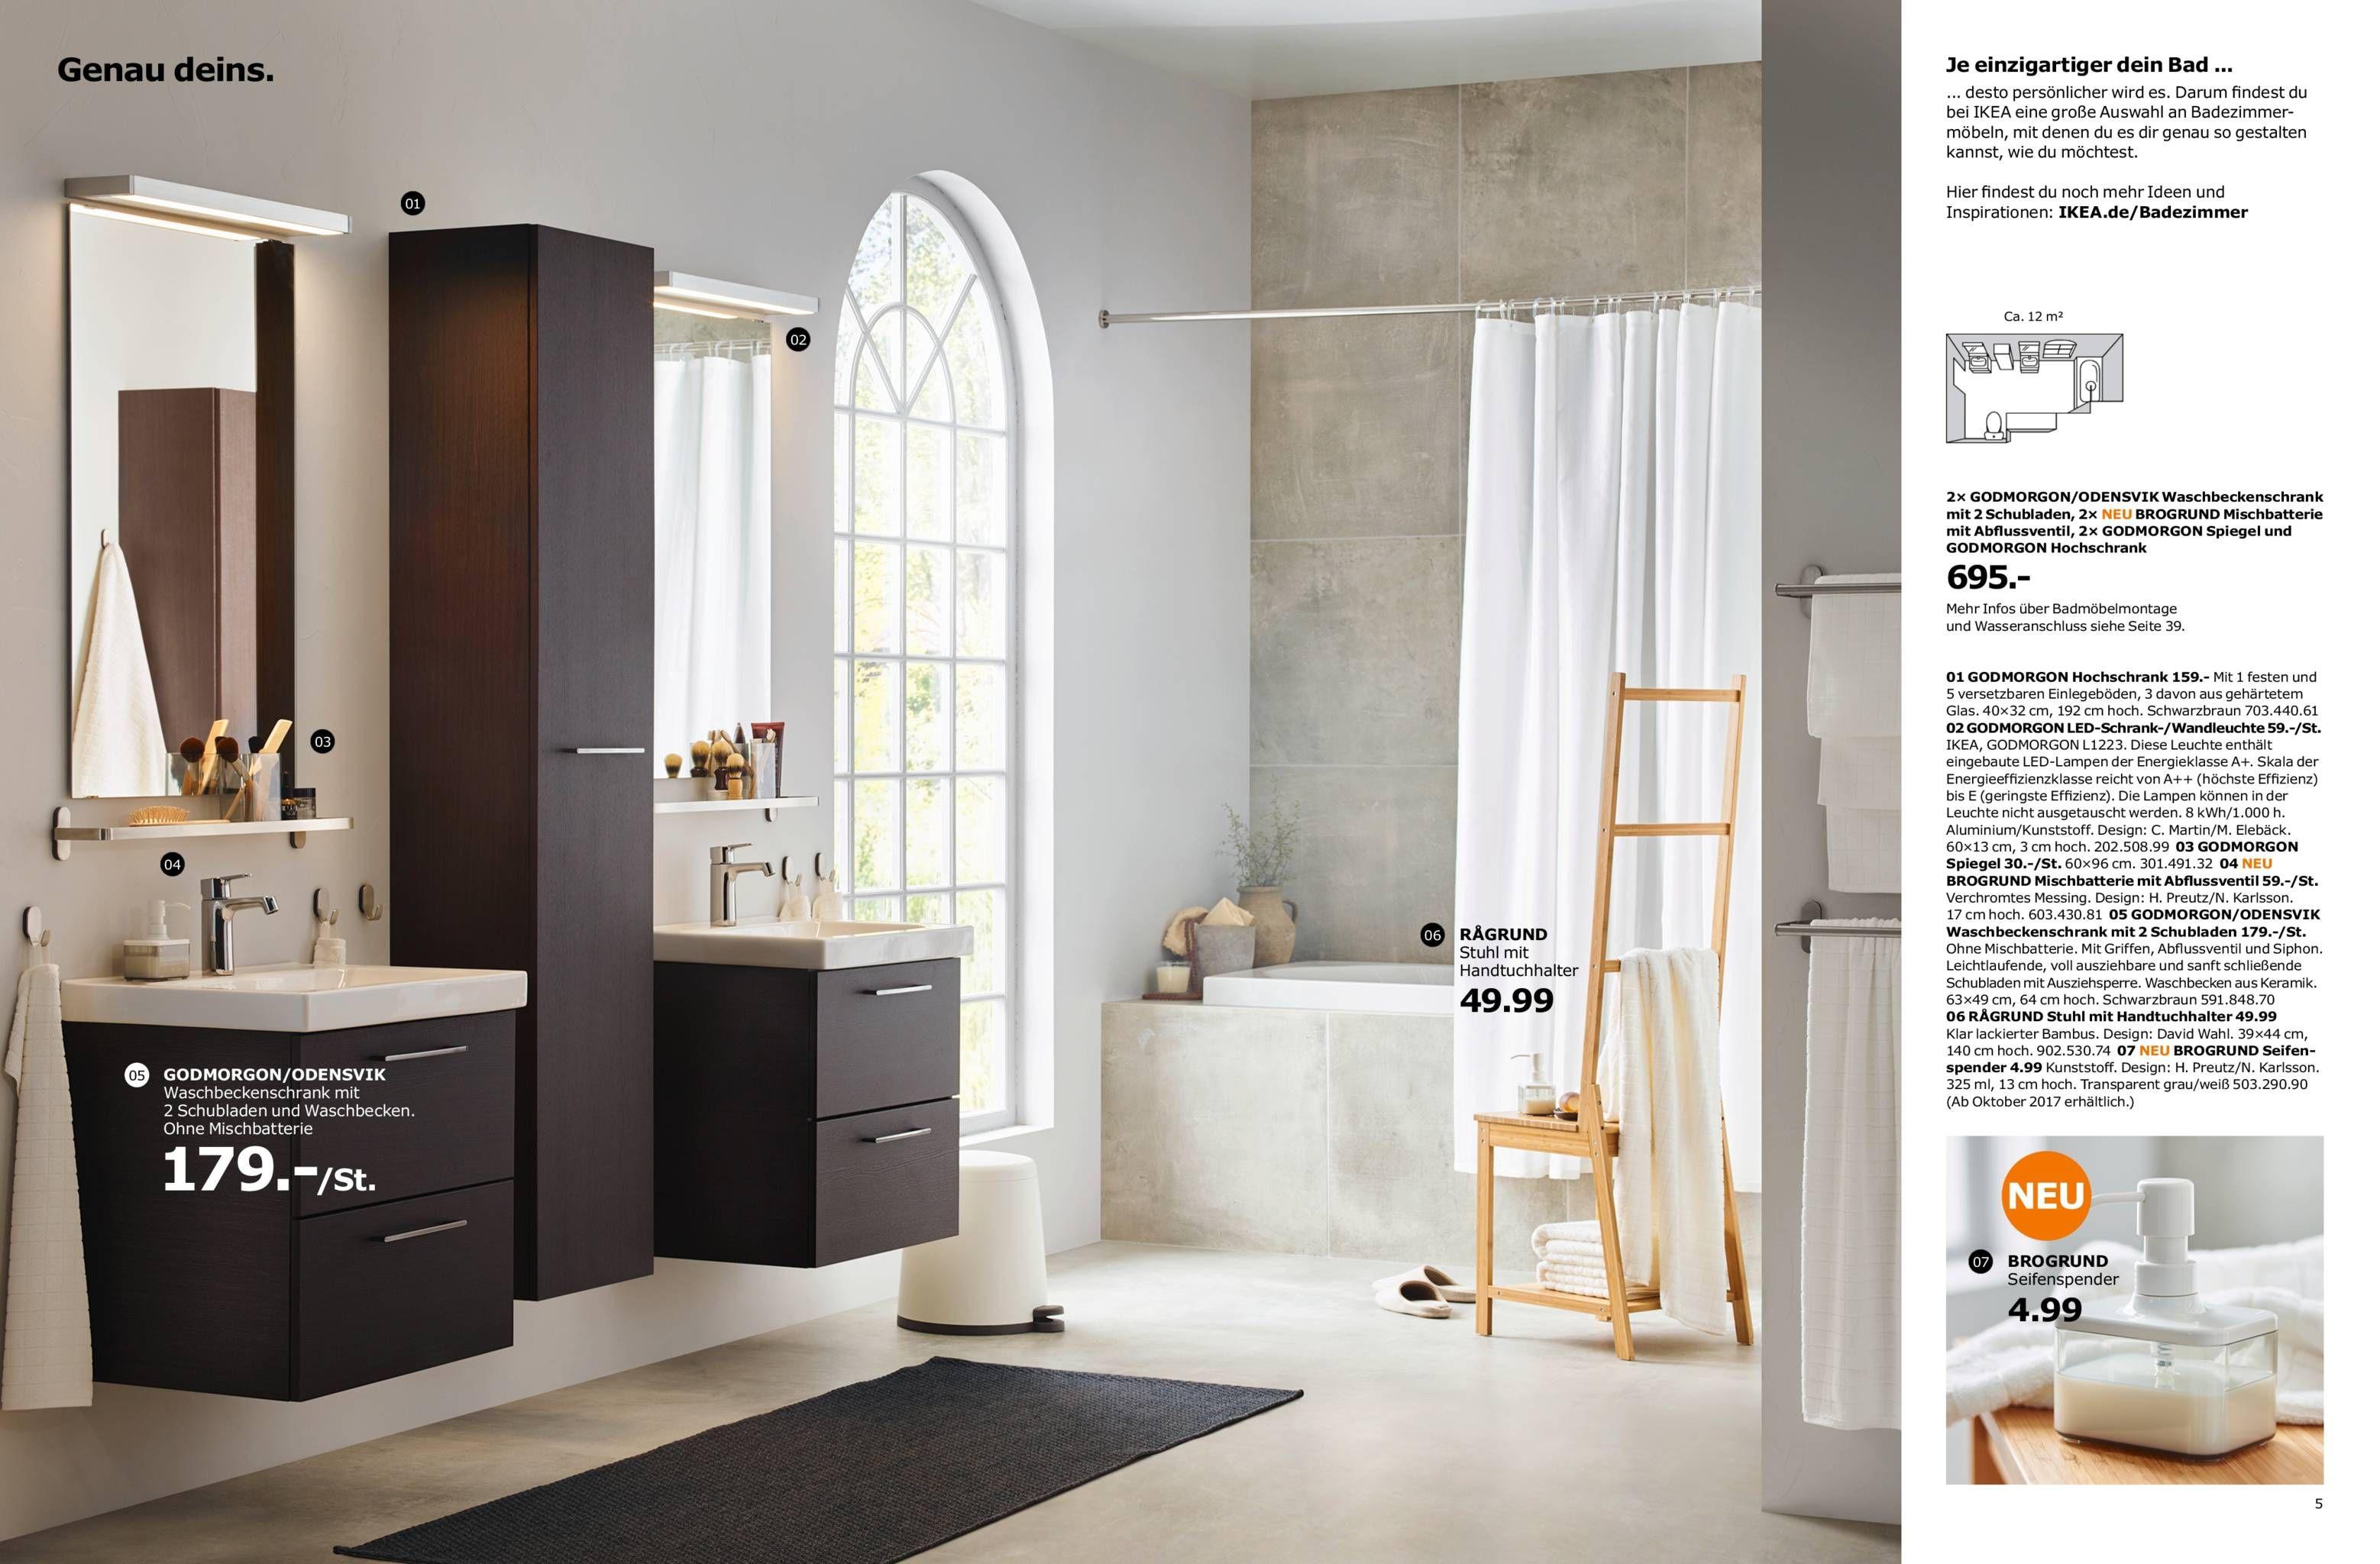 Badezimmer Badezimmer Dekor Badezimmer Einrichtung